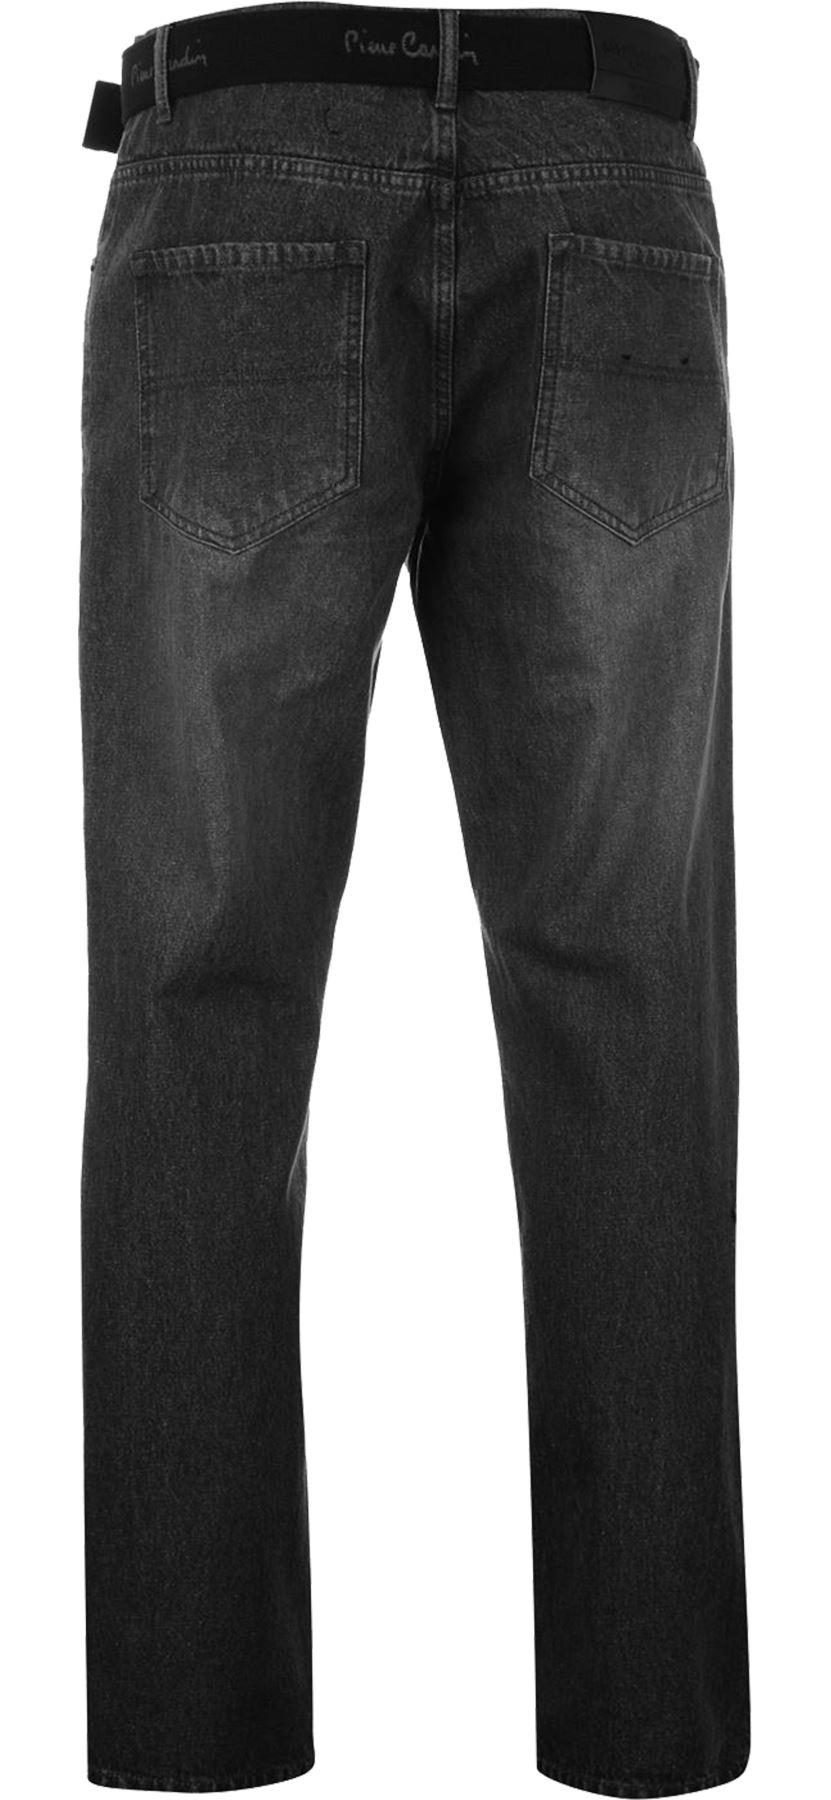 Mens-Belted-Denim-Jeans-Straight-Leg-Regular-Fit-Pierre-Cardin-Pants-Big-Tall thumbnail 8